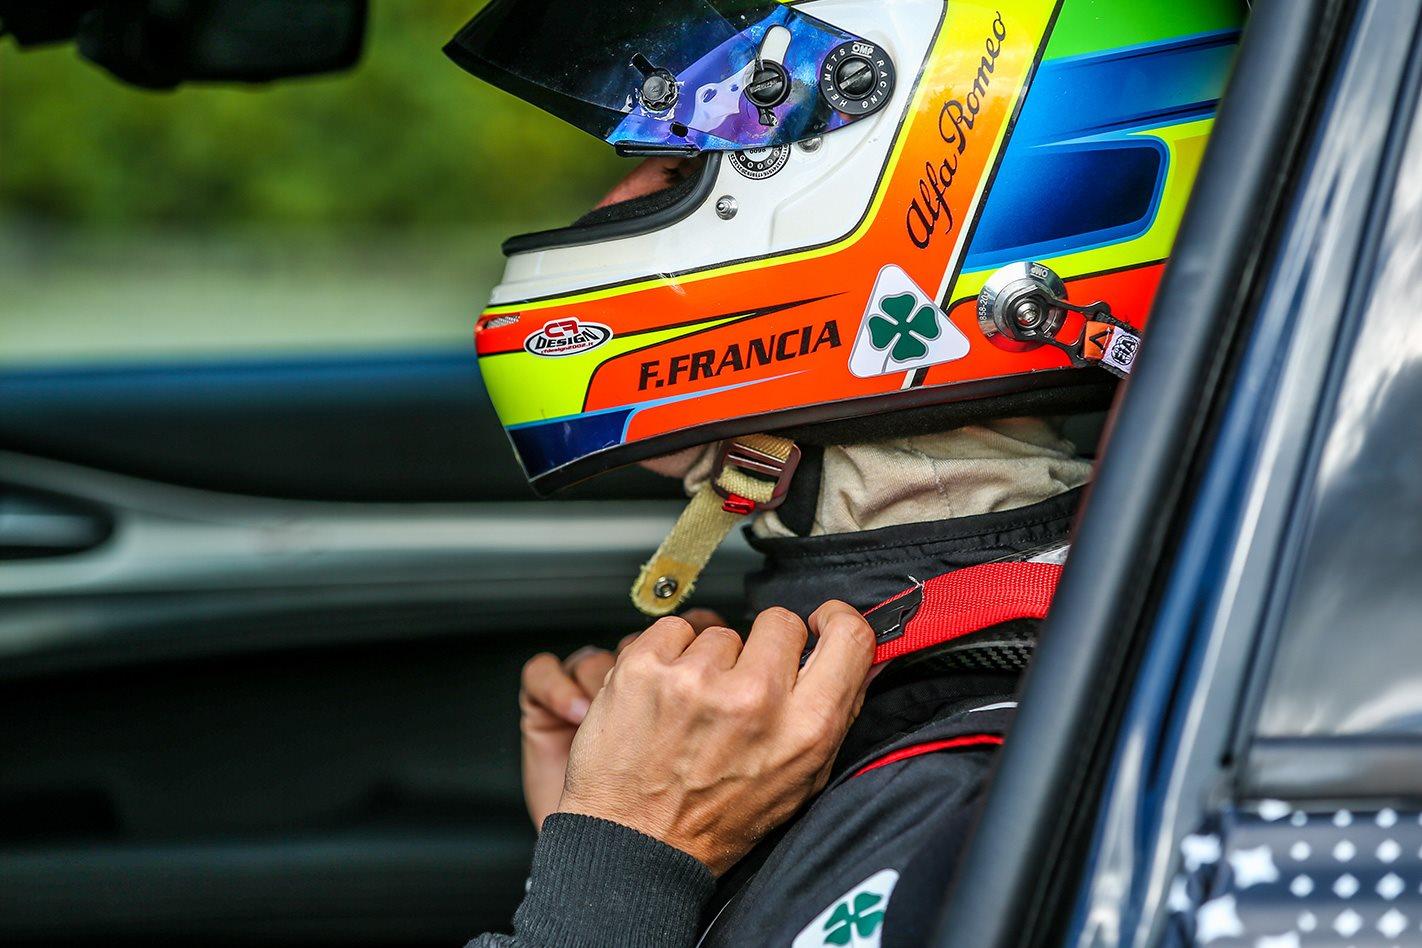 Fabio-Francia-driver.jpg